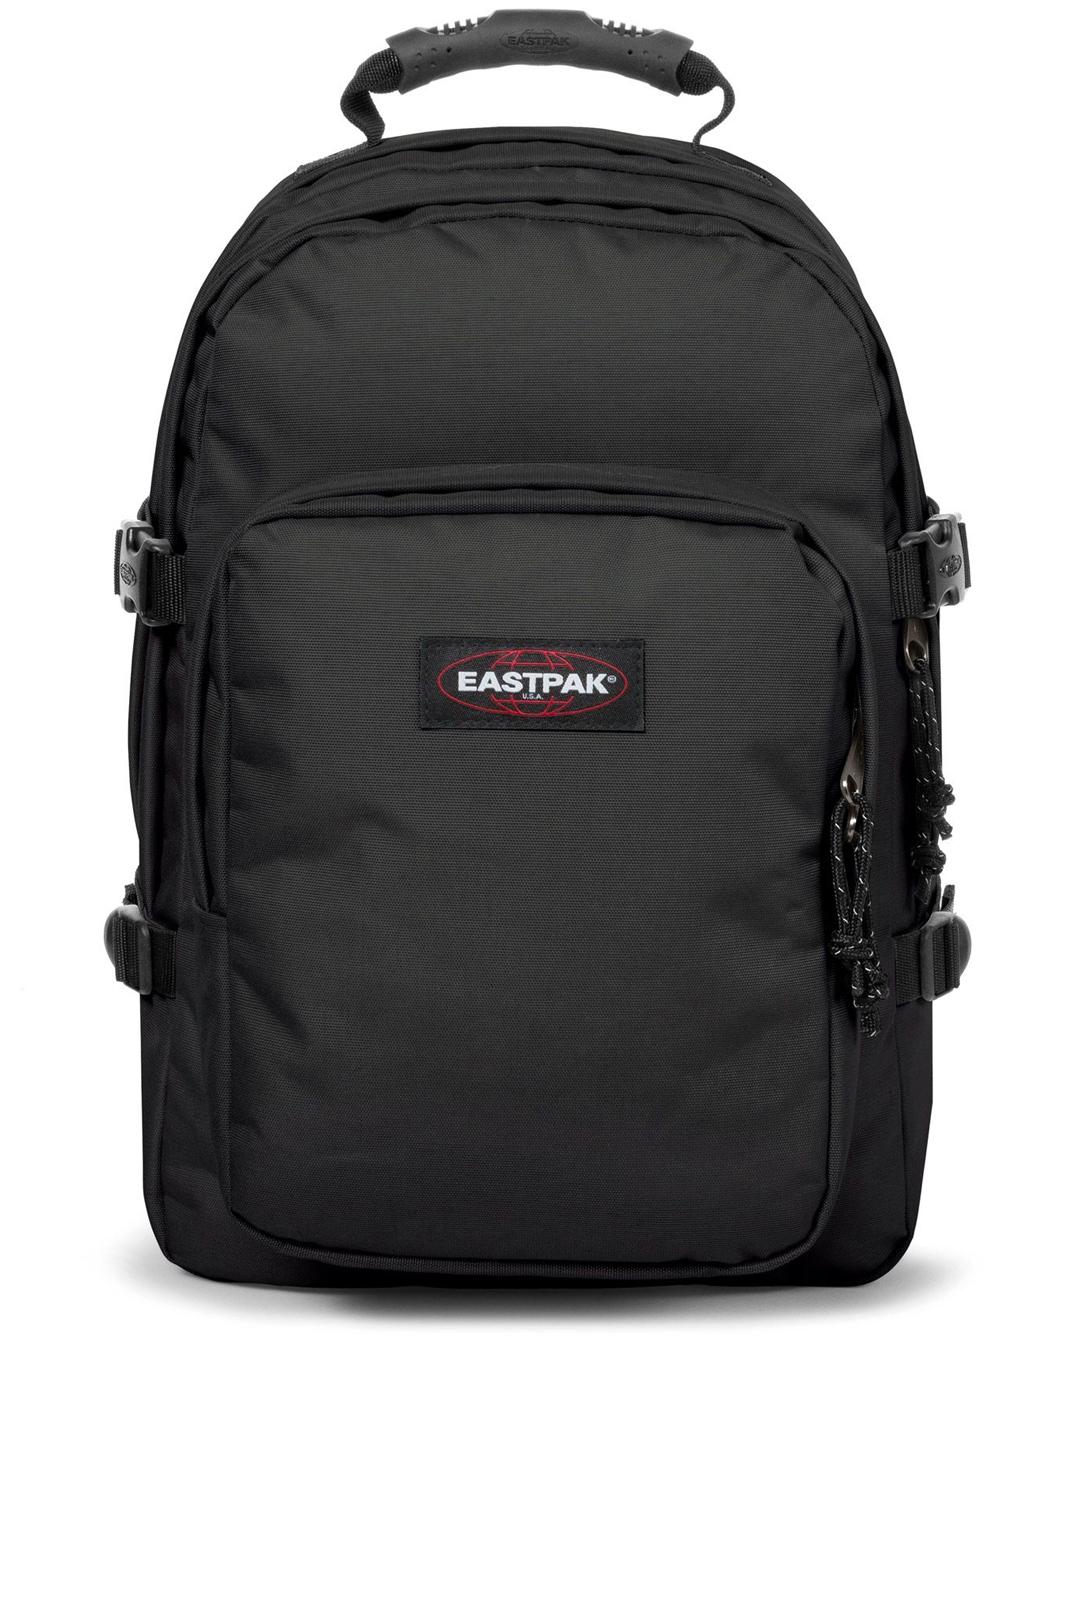 Sacs à dos  Eastpak EK520008 Black